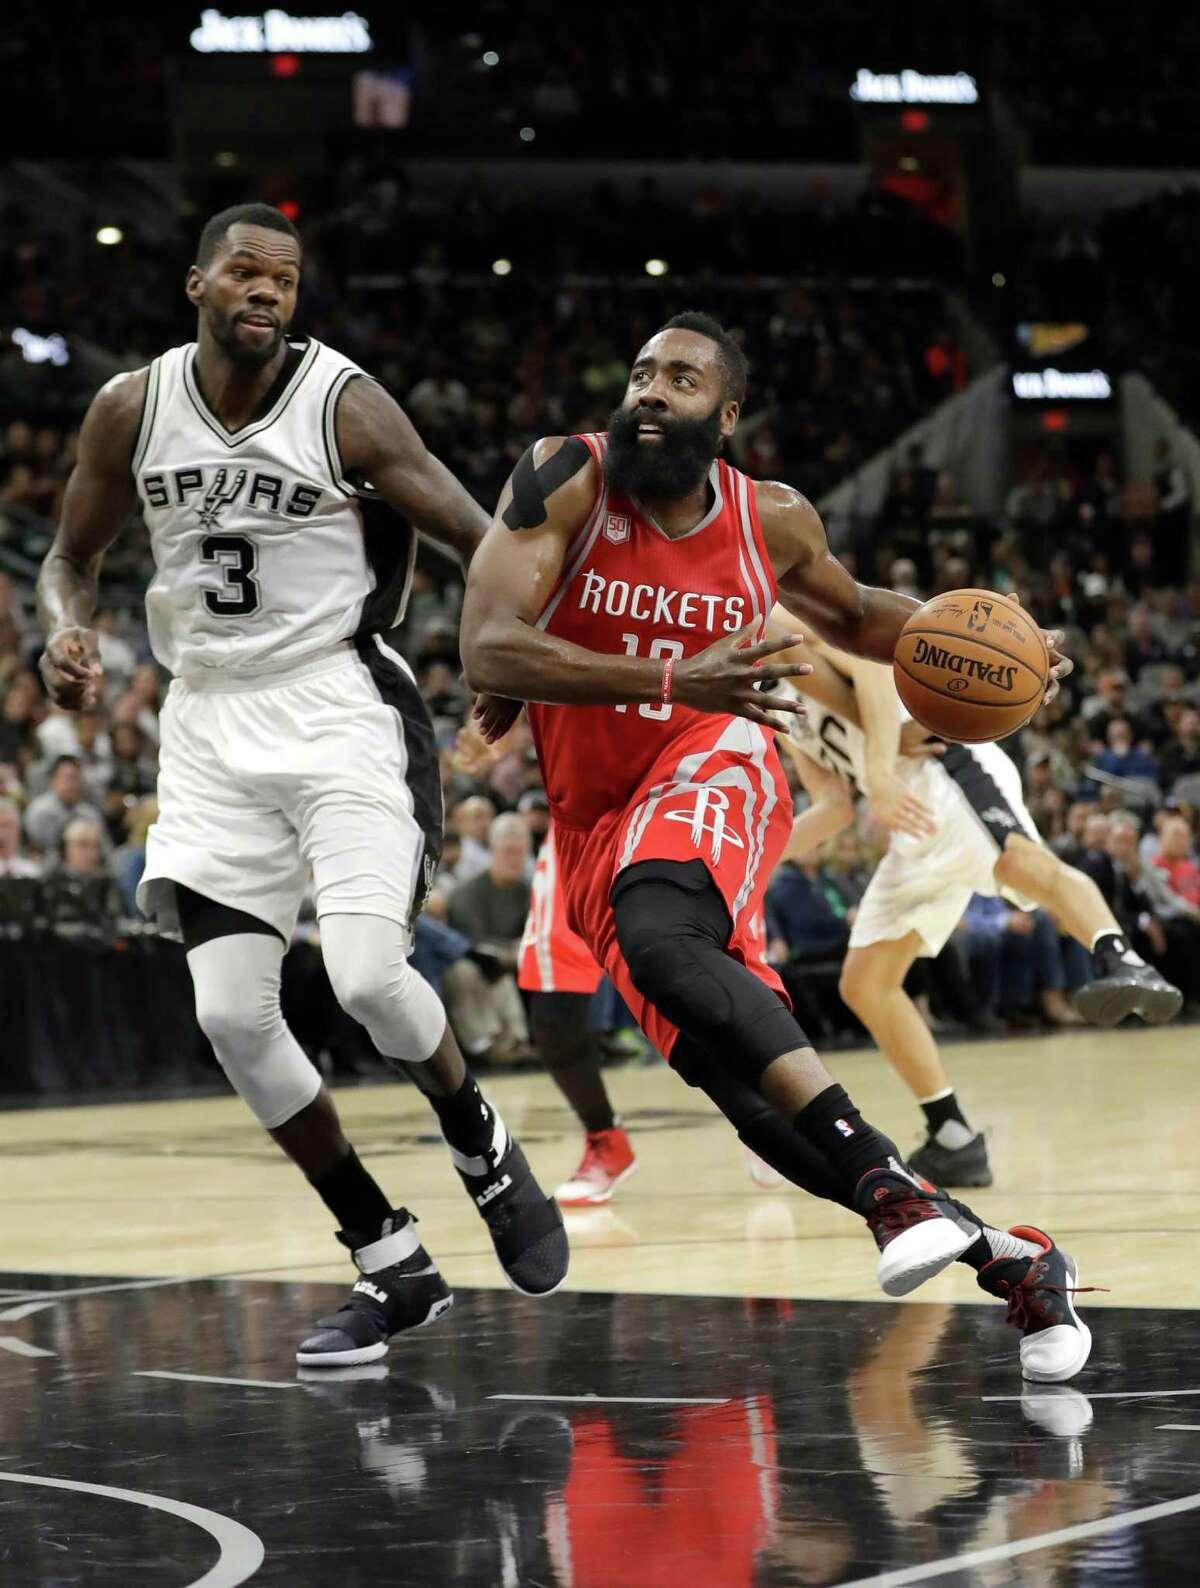 Houston Rockets guard James Harden (13) drives to the basket past San Antonio Spurs center Dewayne Dedmon (3) during the first half of an NBA basketball game, Wednesday, Nov. 9, 2016, in San Antonio. (AP Photo/Eric Gay)